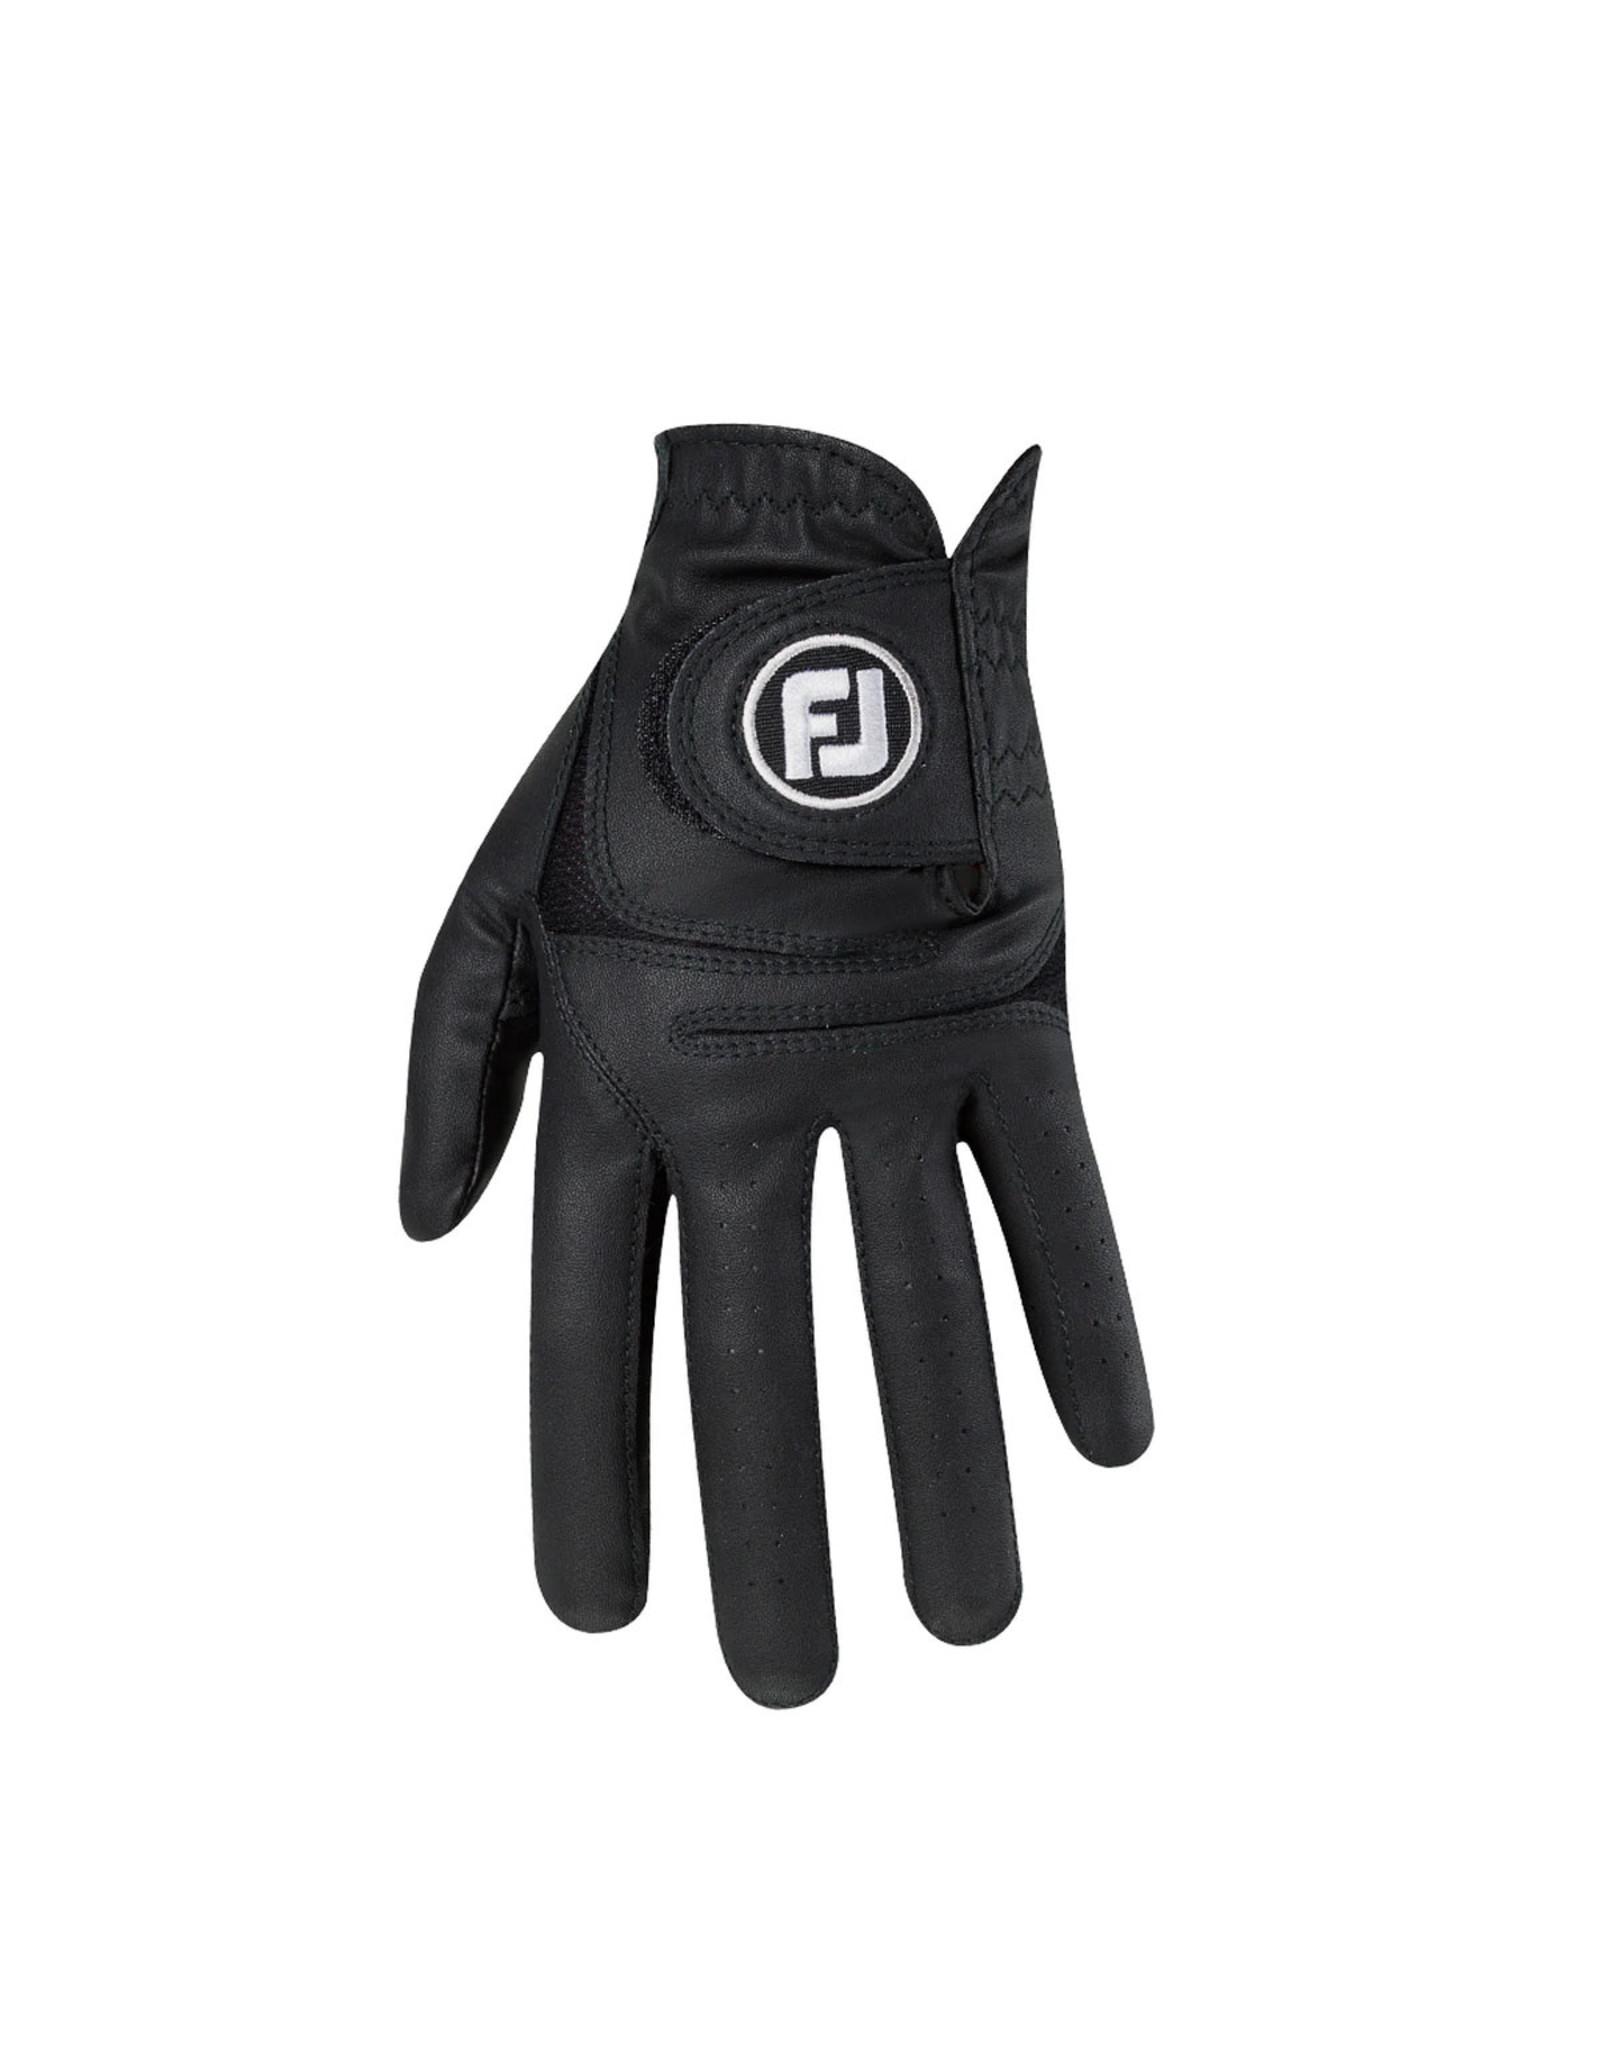 FootJoy FootJoy WeatherSof Men's Glove Black